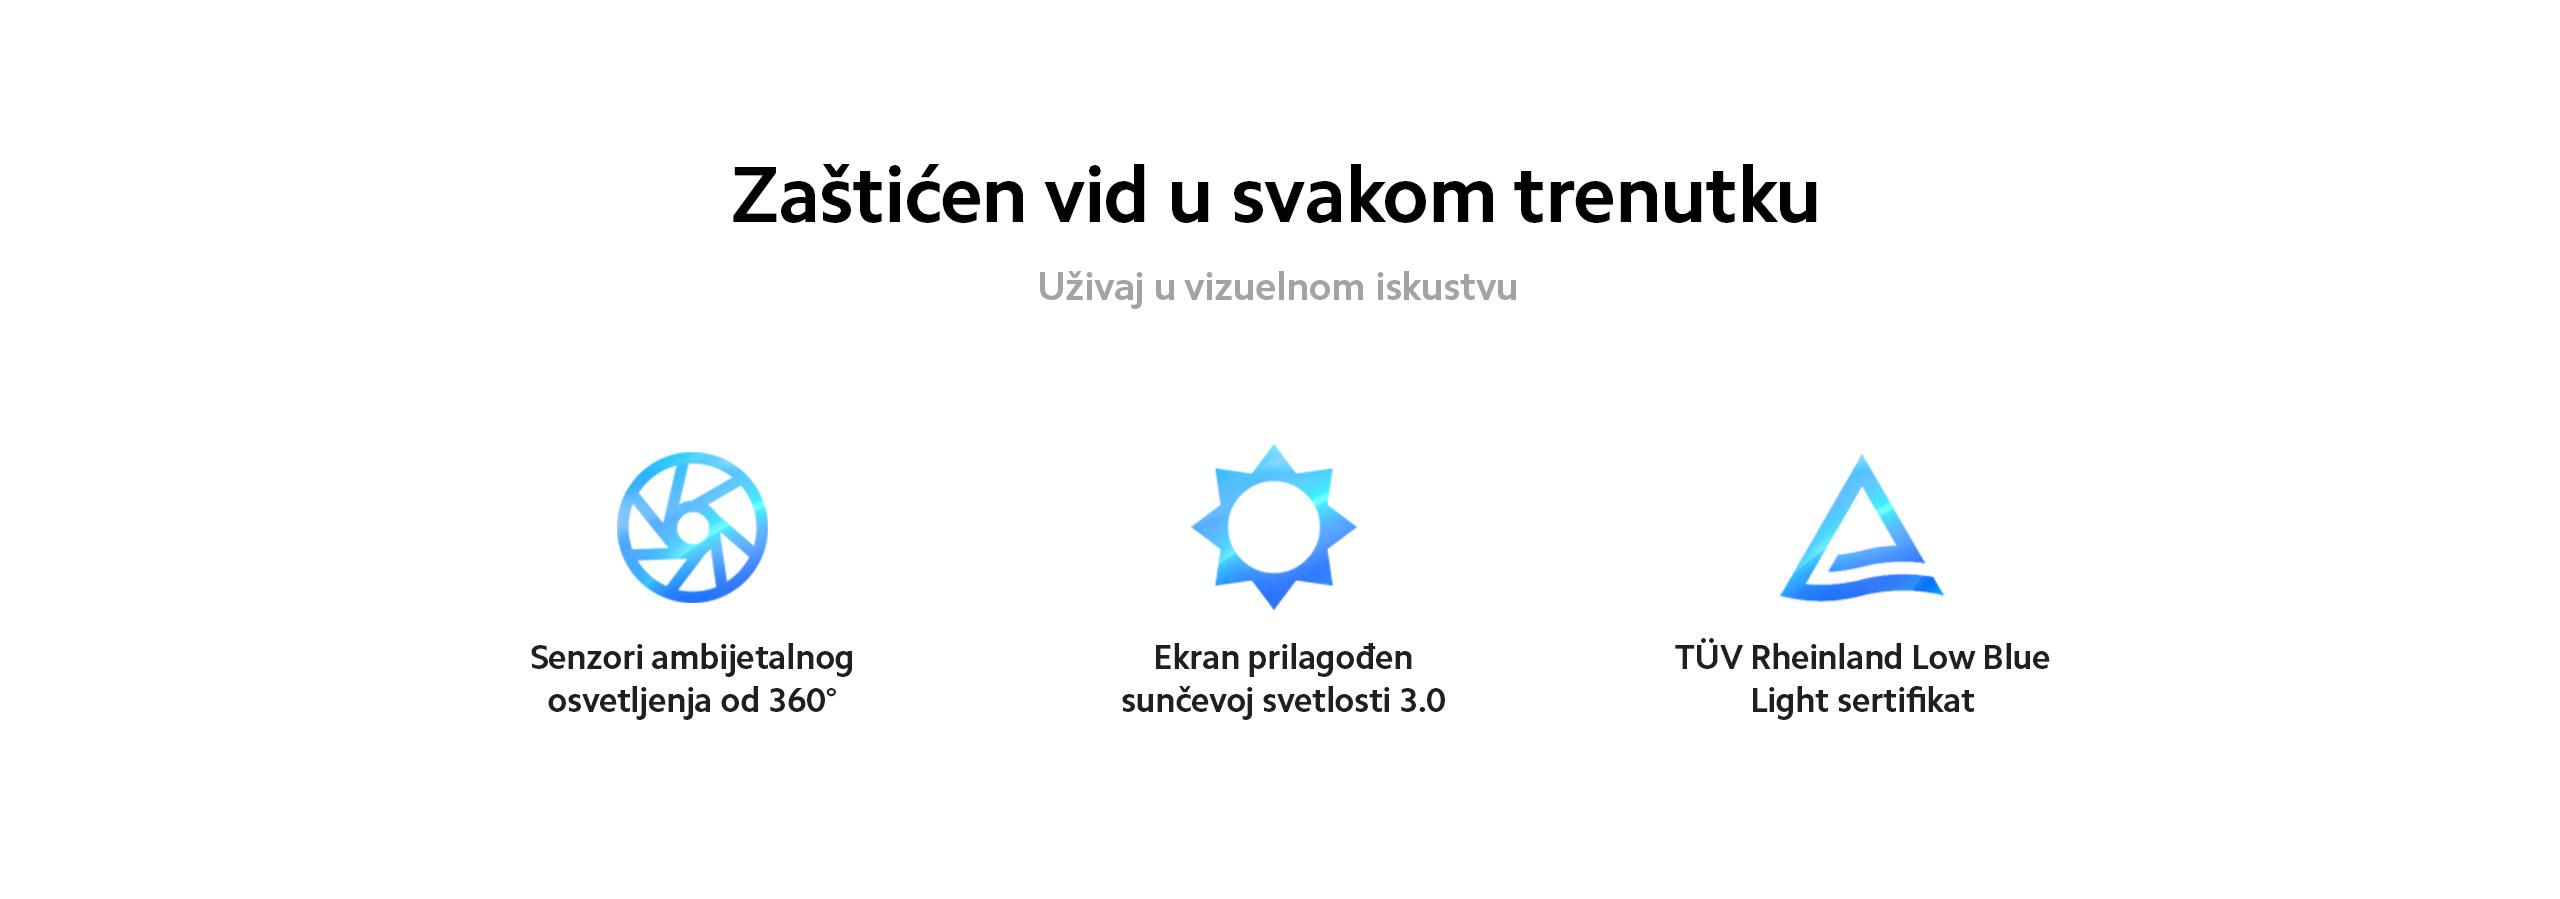 https://mi-srbija.rs/storage/media/2020/11/5/e62c6e12-624c-4378-ade3-e06208352969.jpg